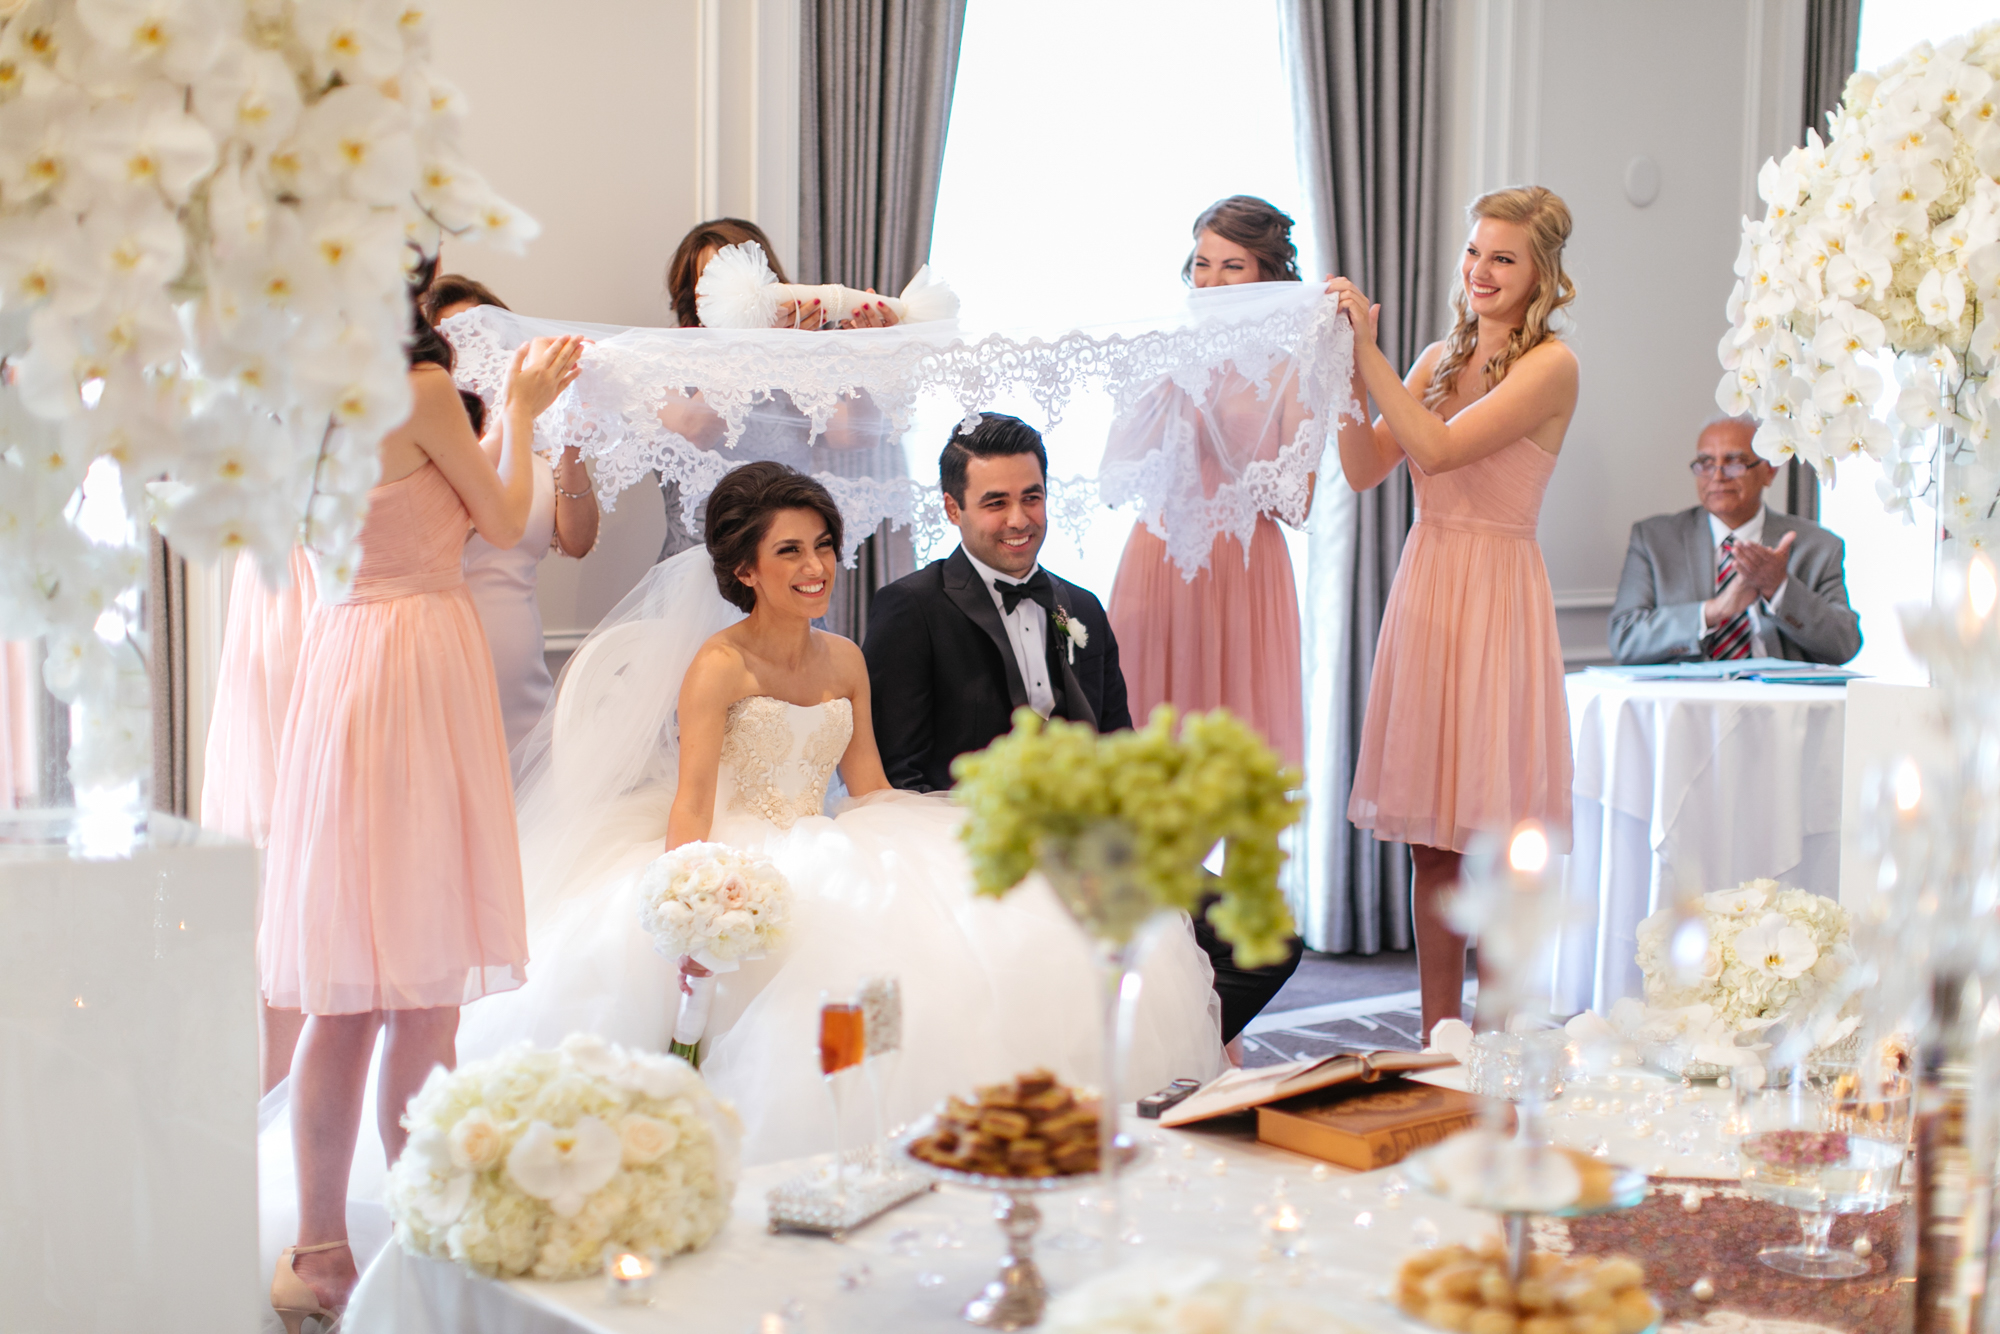 vancouver-luxury-wedding-photographer-lori-miles--17.jpg